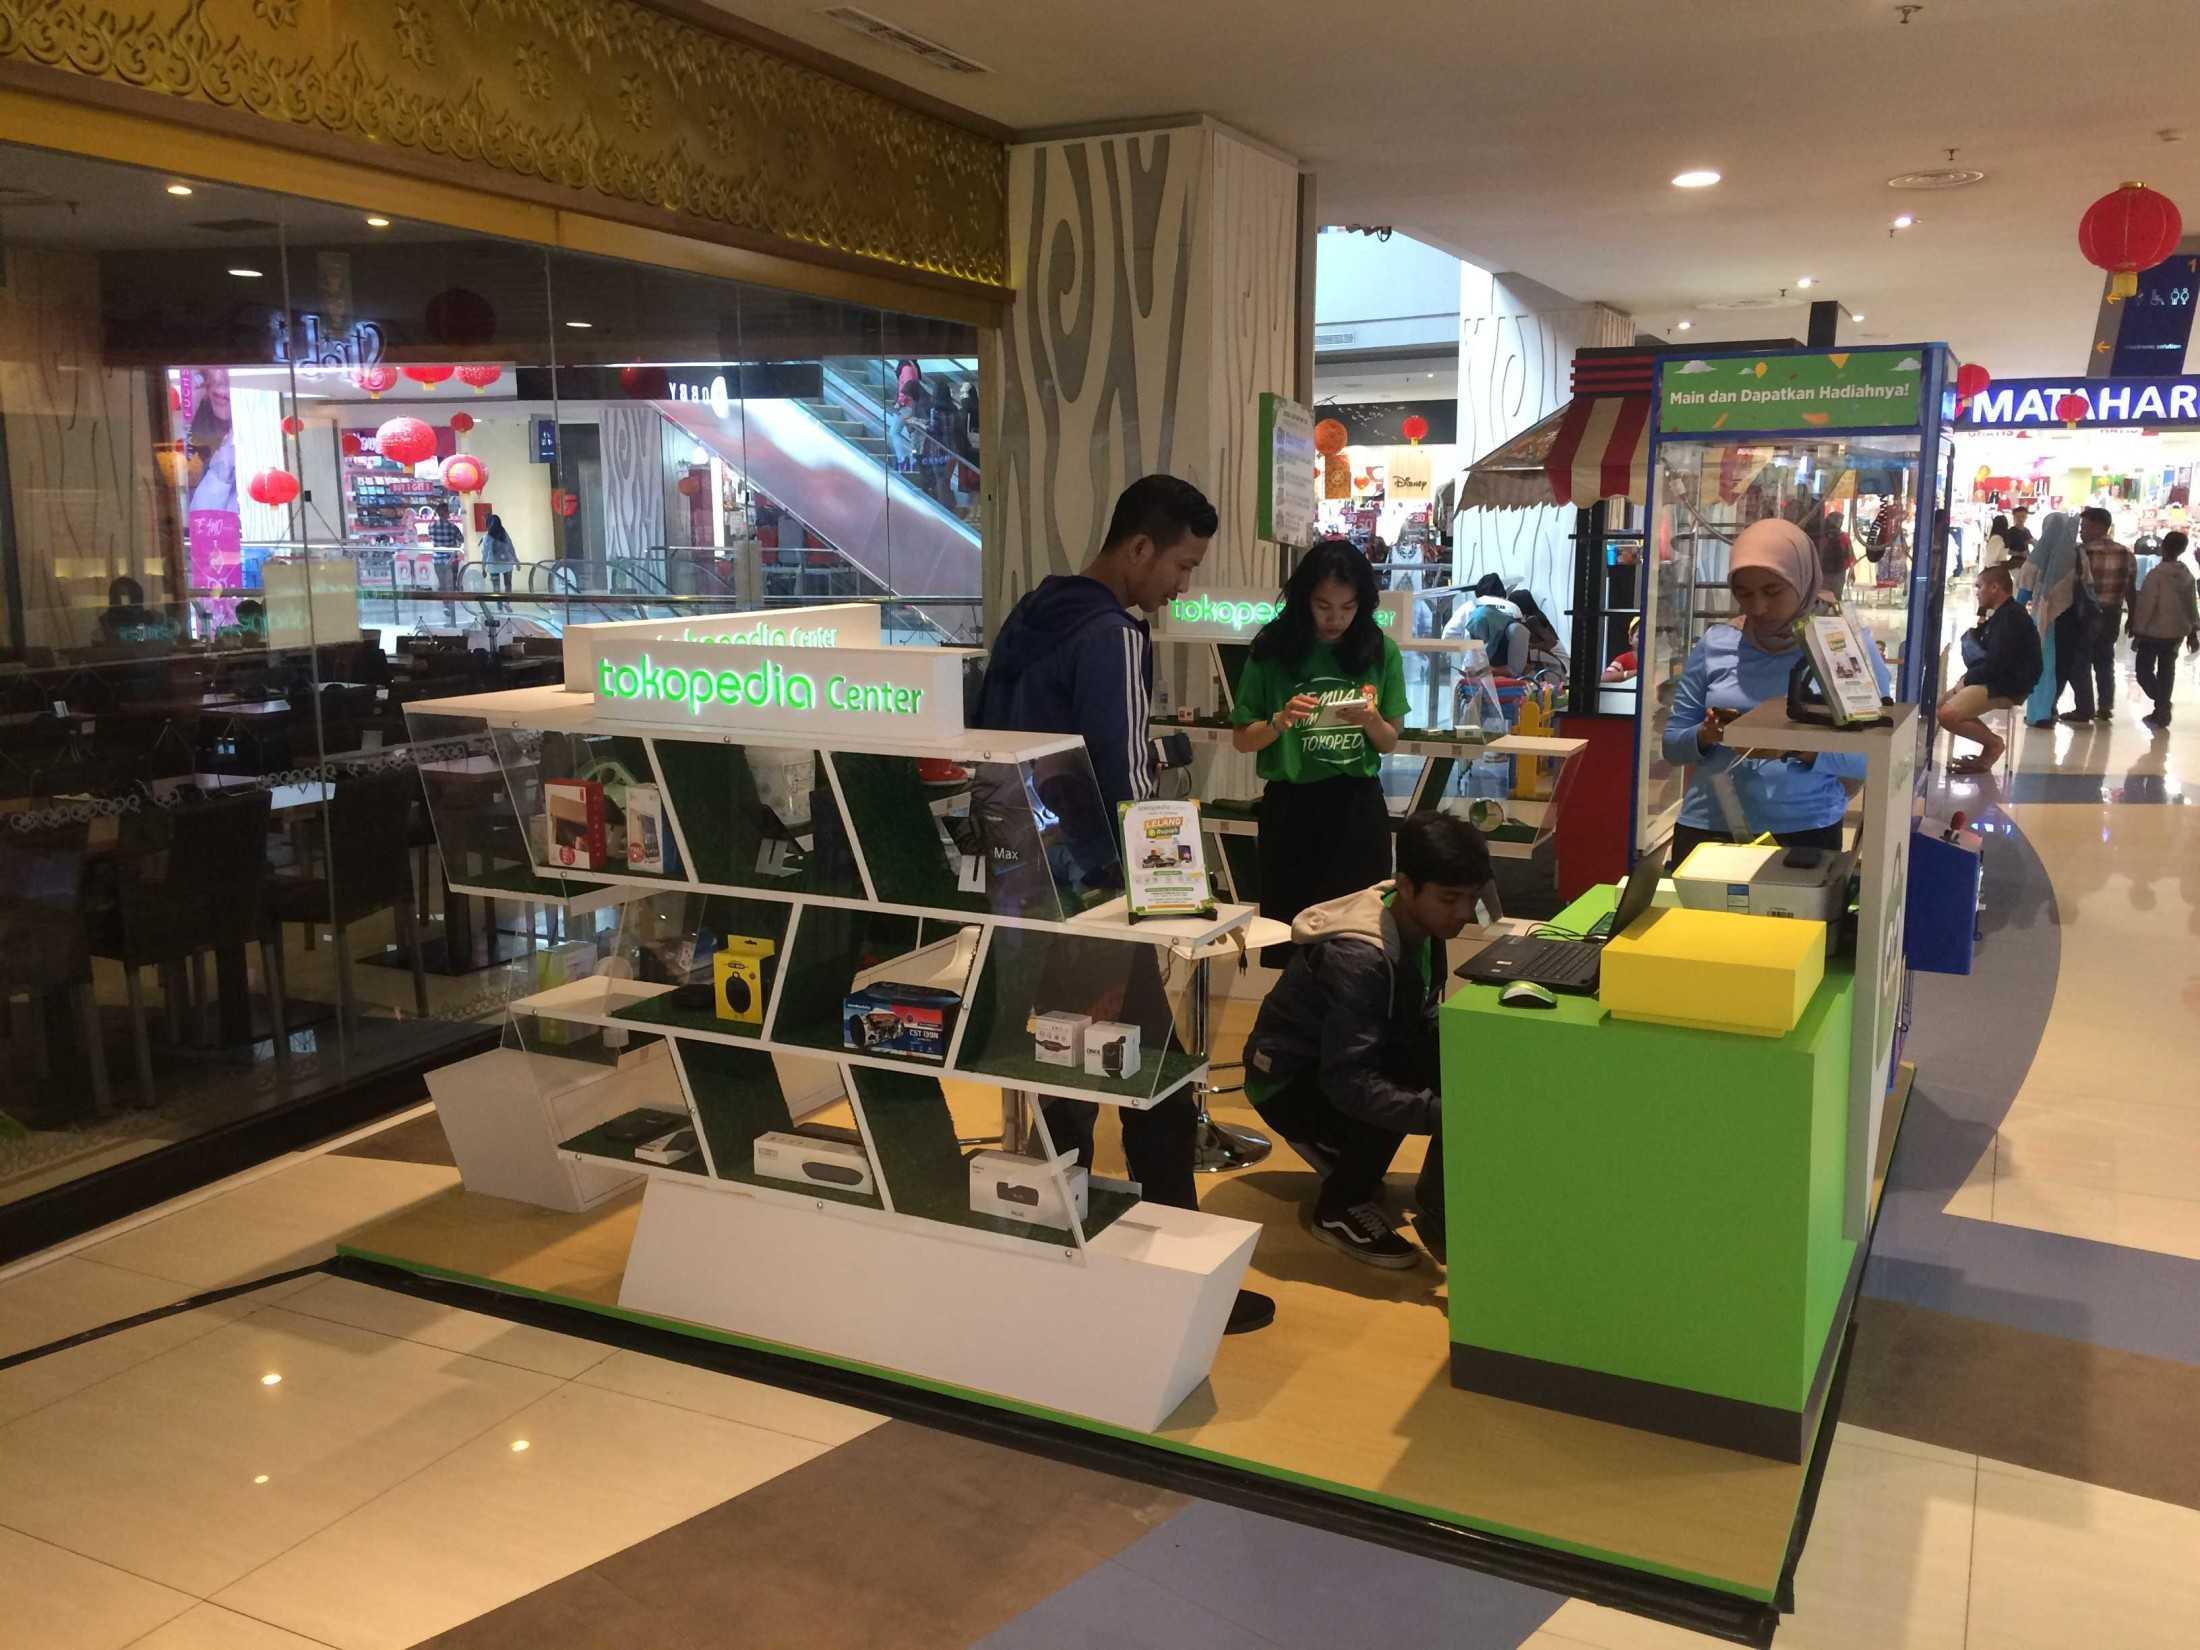 Pt.buana Pratama Interindo Tokopedia Retail Cirebon, Kota Cirebon, Jawa Barat, Indonesia Cirebon, Kota Cirebon, Jawa Barat, Indonesia Ptbuana-Pratama-Interindo-Tokopedia-Retail  67126